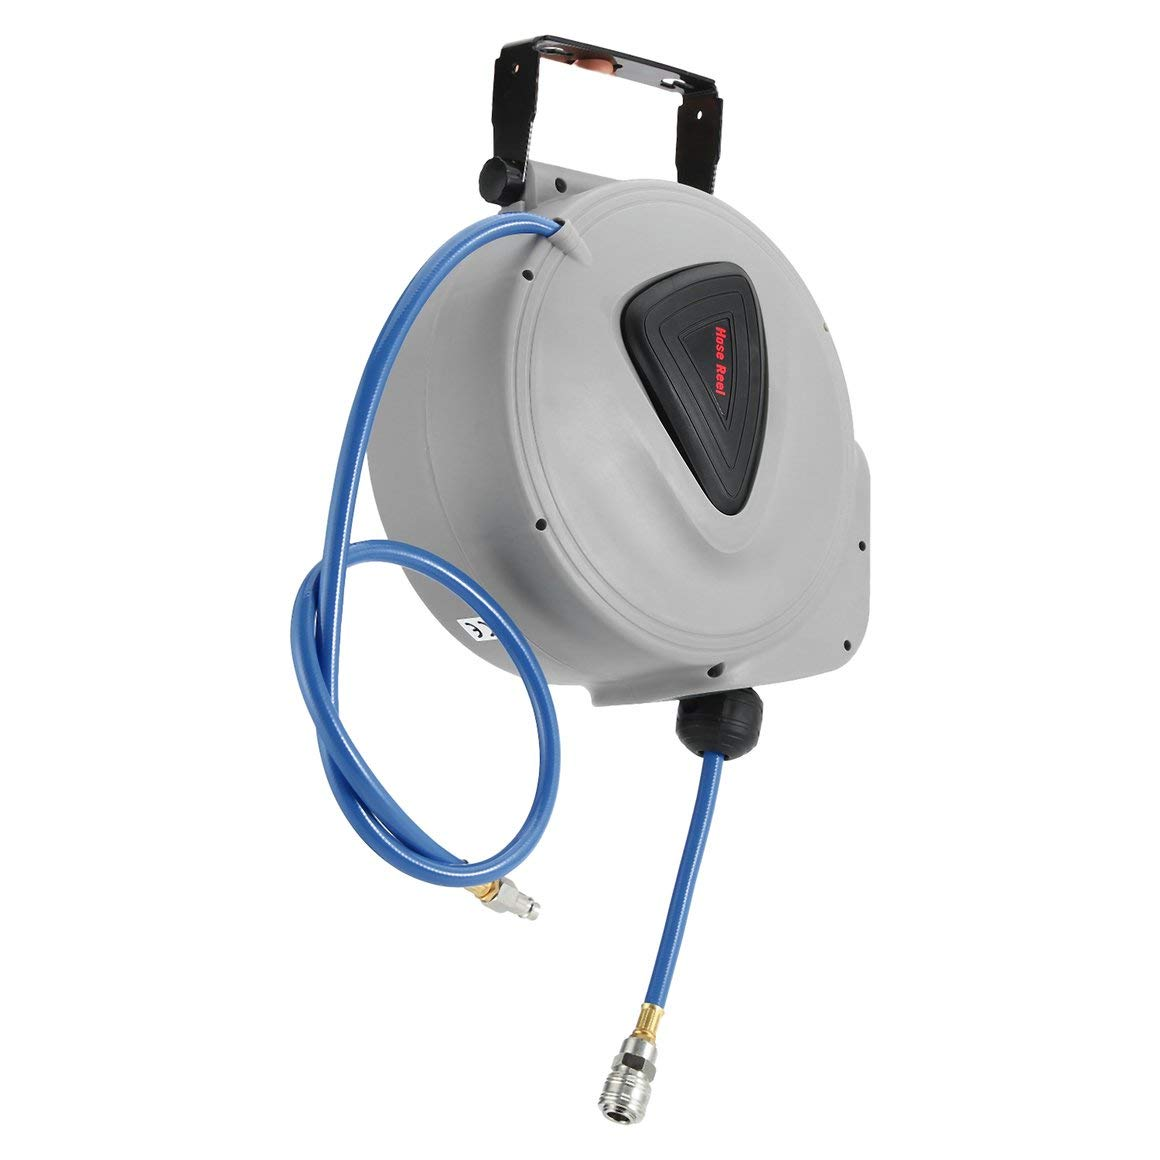 Funnyrunstore 180 grados rotativo manguera de aire comprimido carrete 10M resistente a los rayos UV 1/4 pulgada manguera automática carrete taller ...